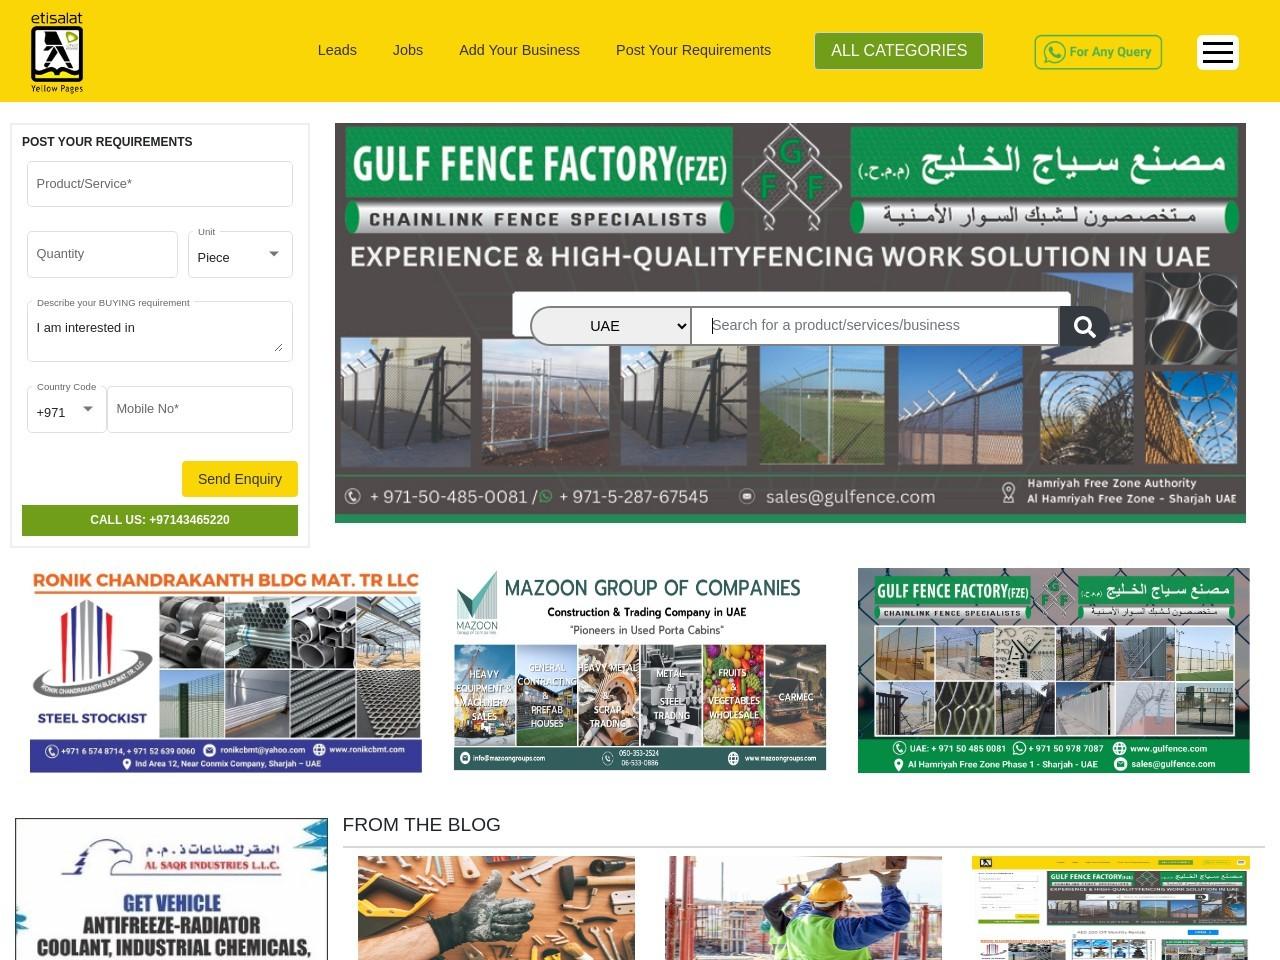 List of Hotels in Abu Dhabi | List of Hotels Dubai